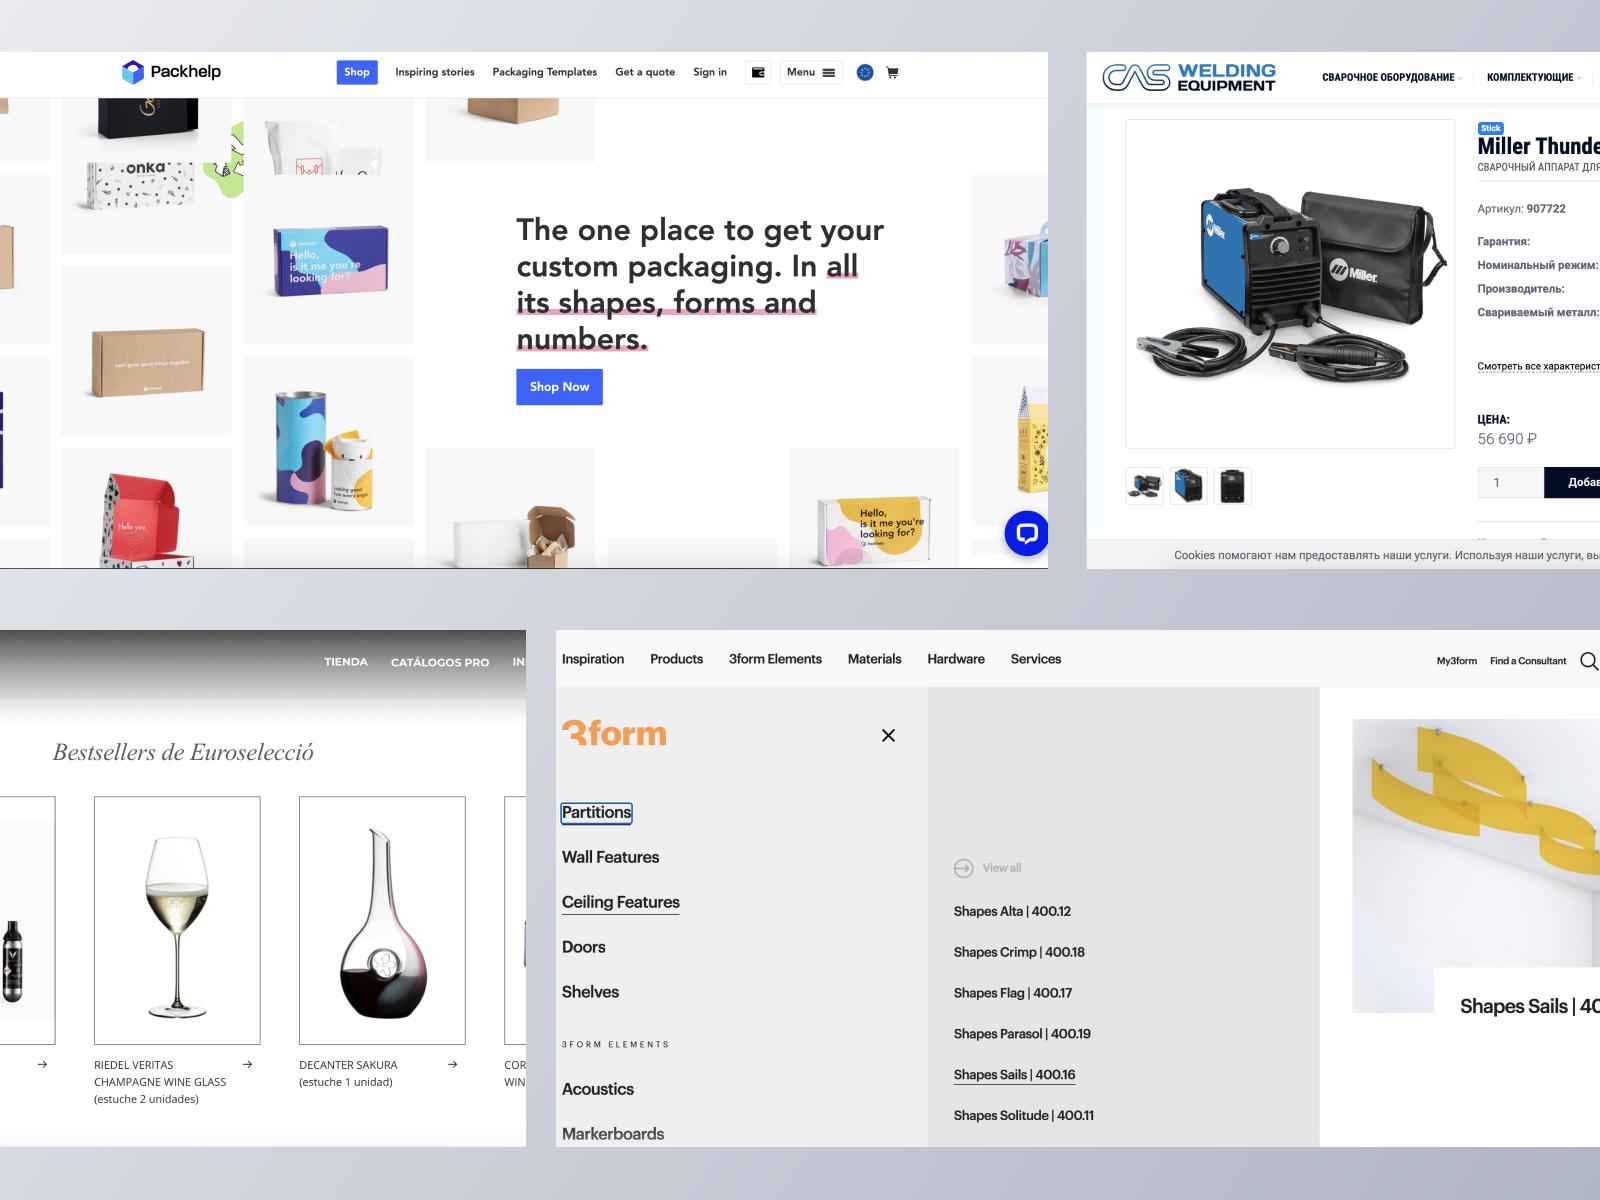 B2B ecommerce websites using Spree Commerce